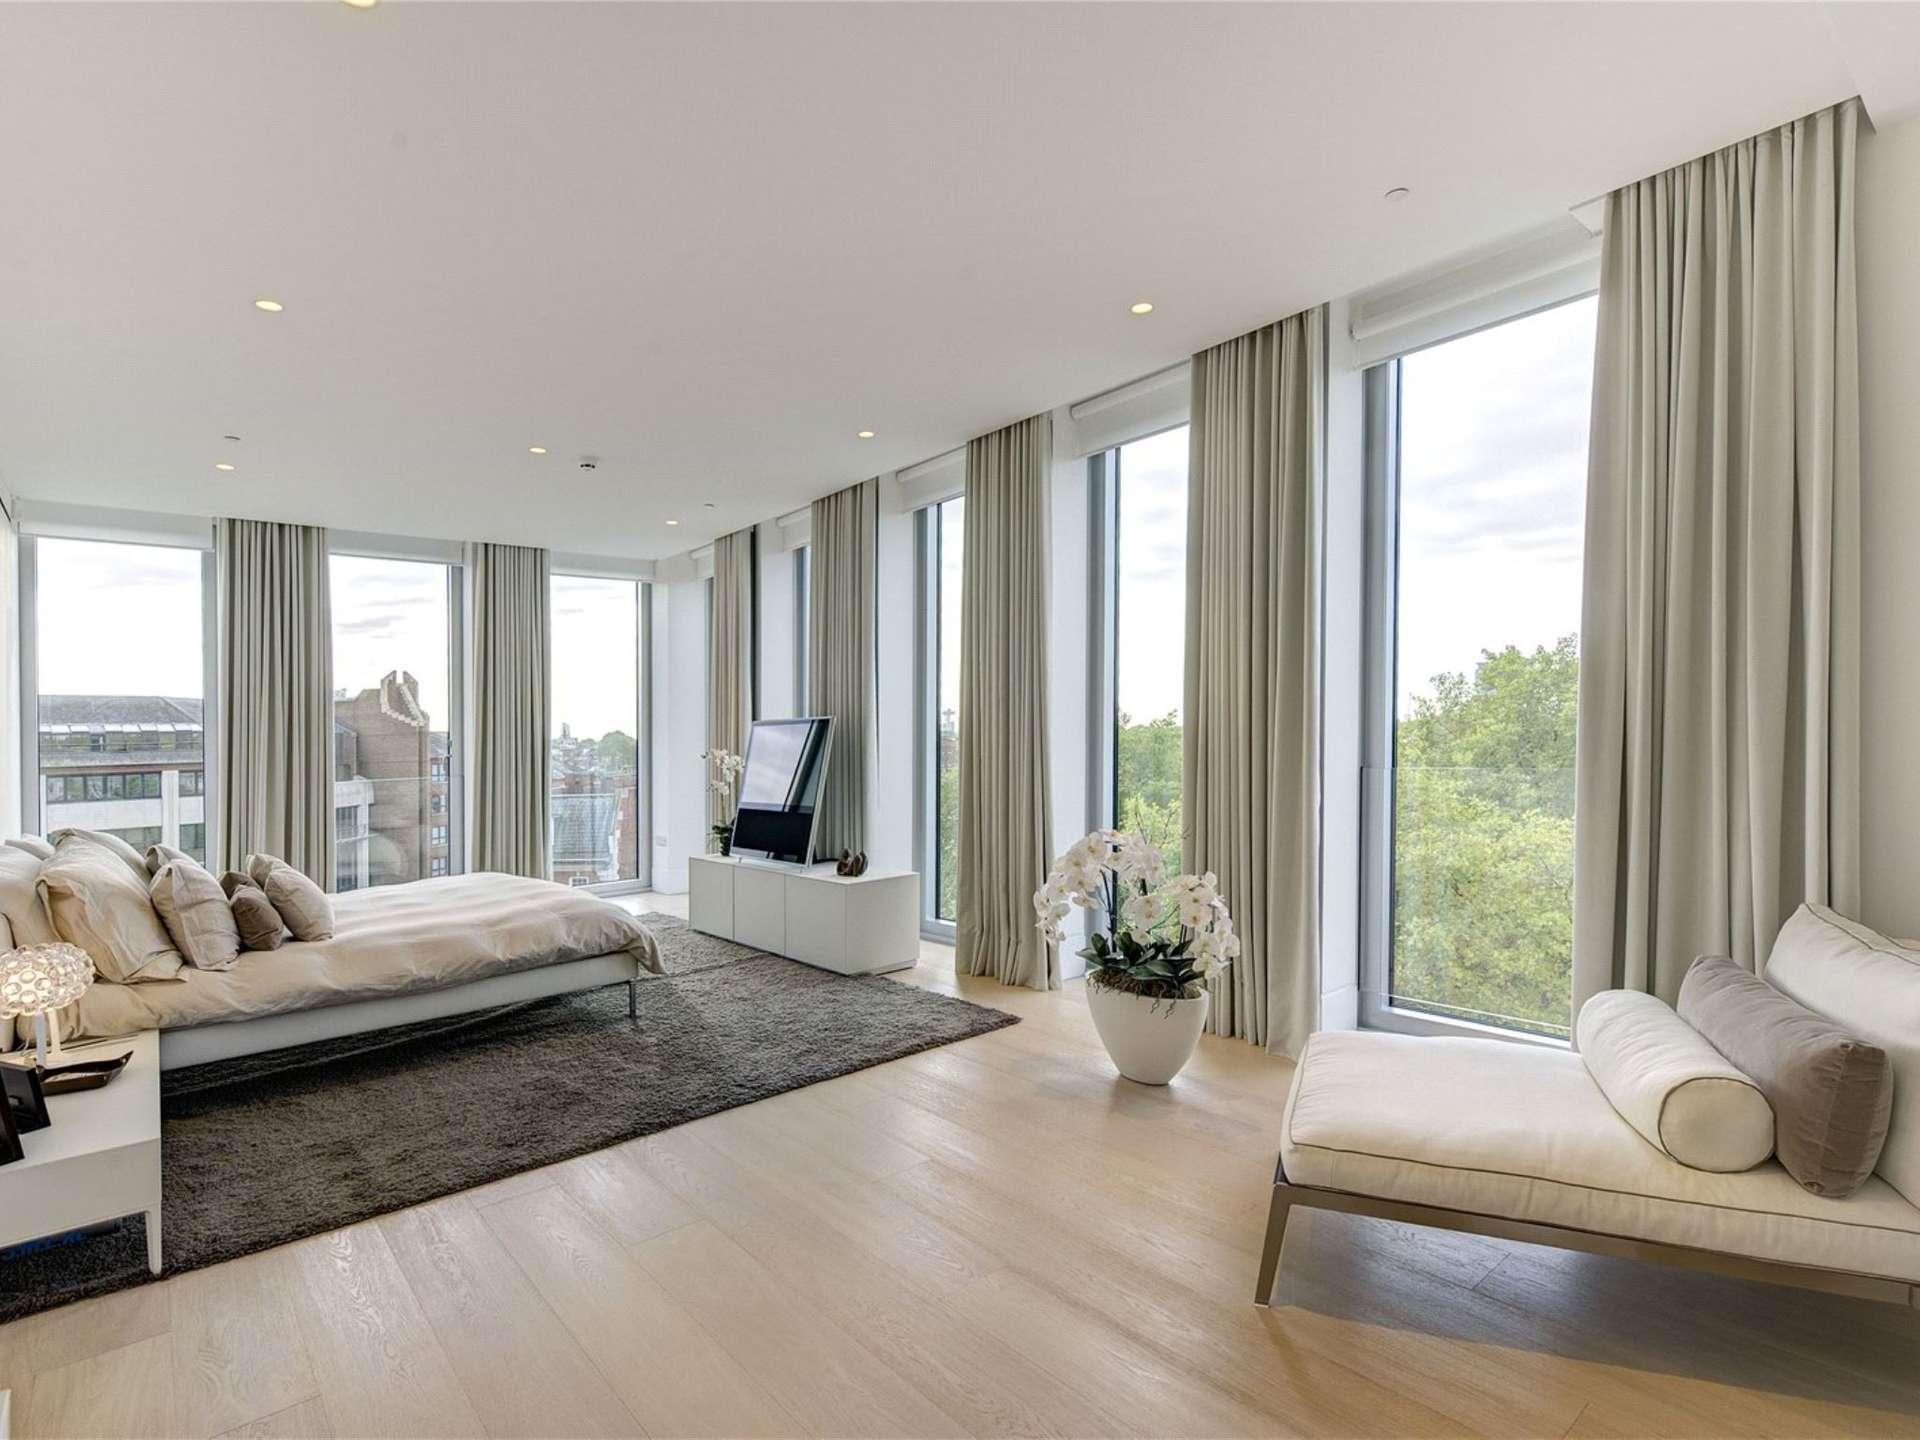 Savills - Hollandgreen Place, Kensington, London, W8 6Ax - Property